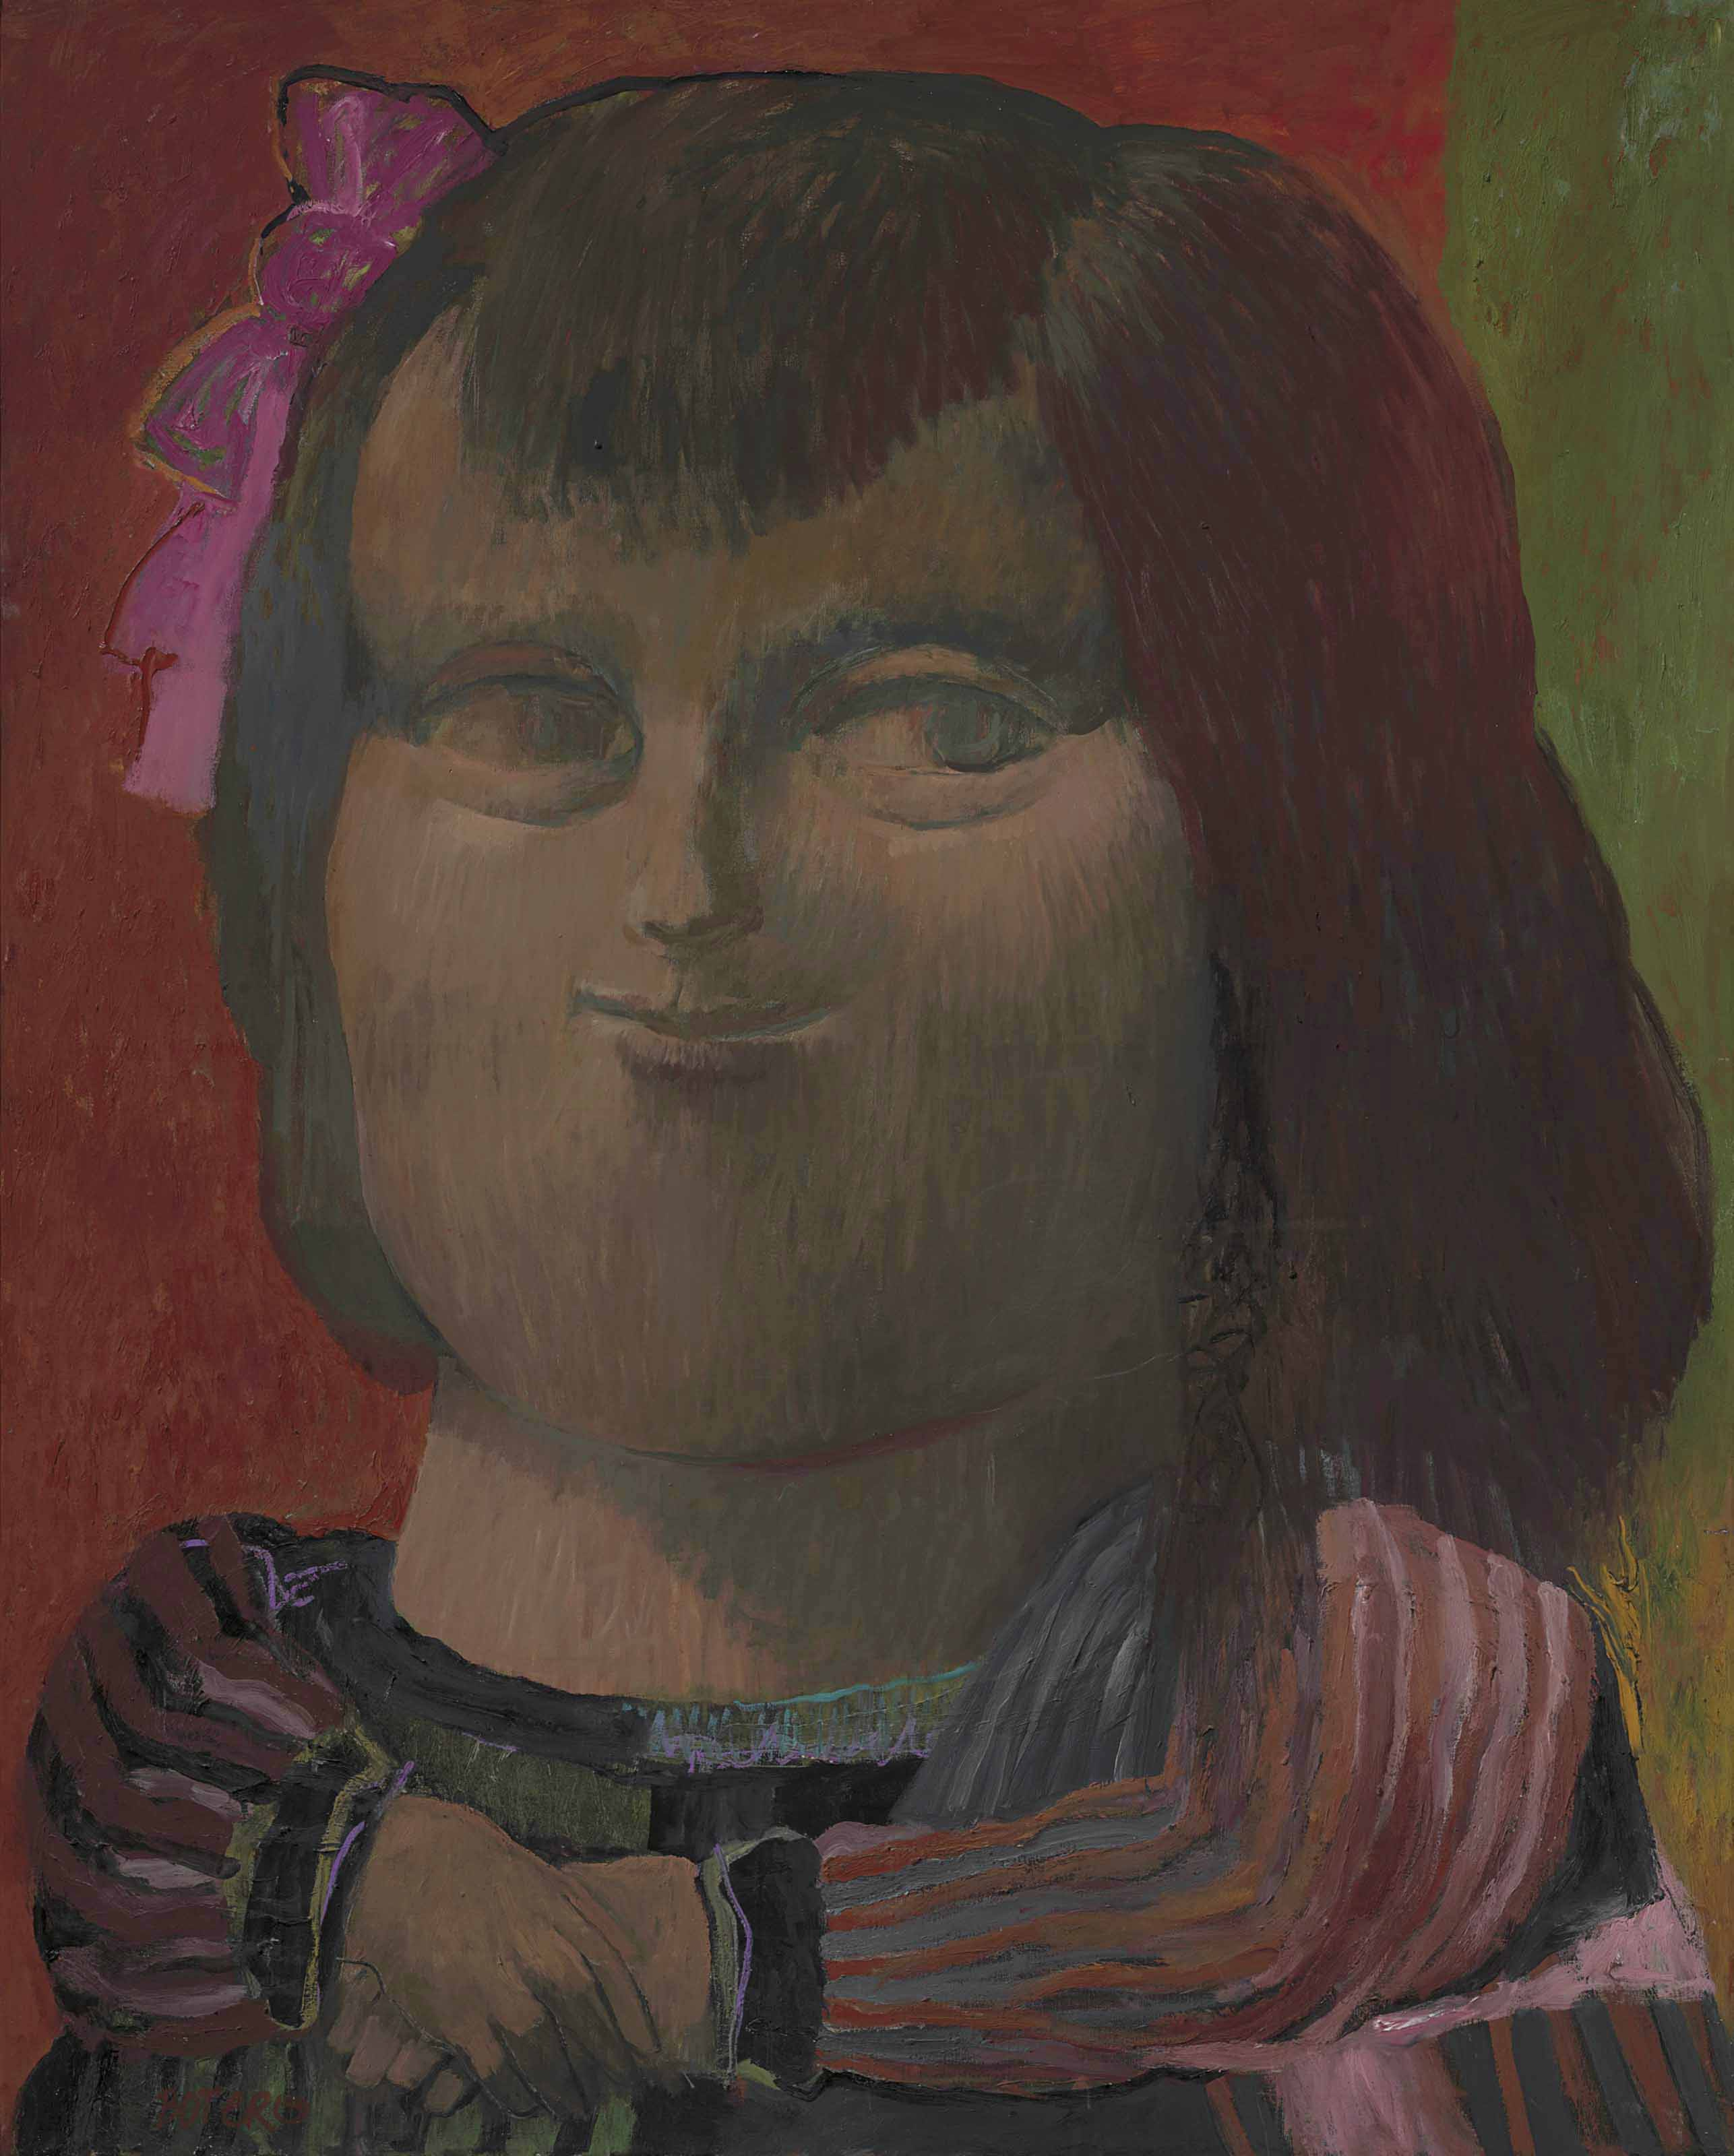 Fernando Botero B 1932 Mona Lisa 1950s Paintings Christies